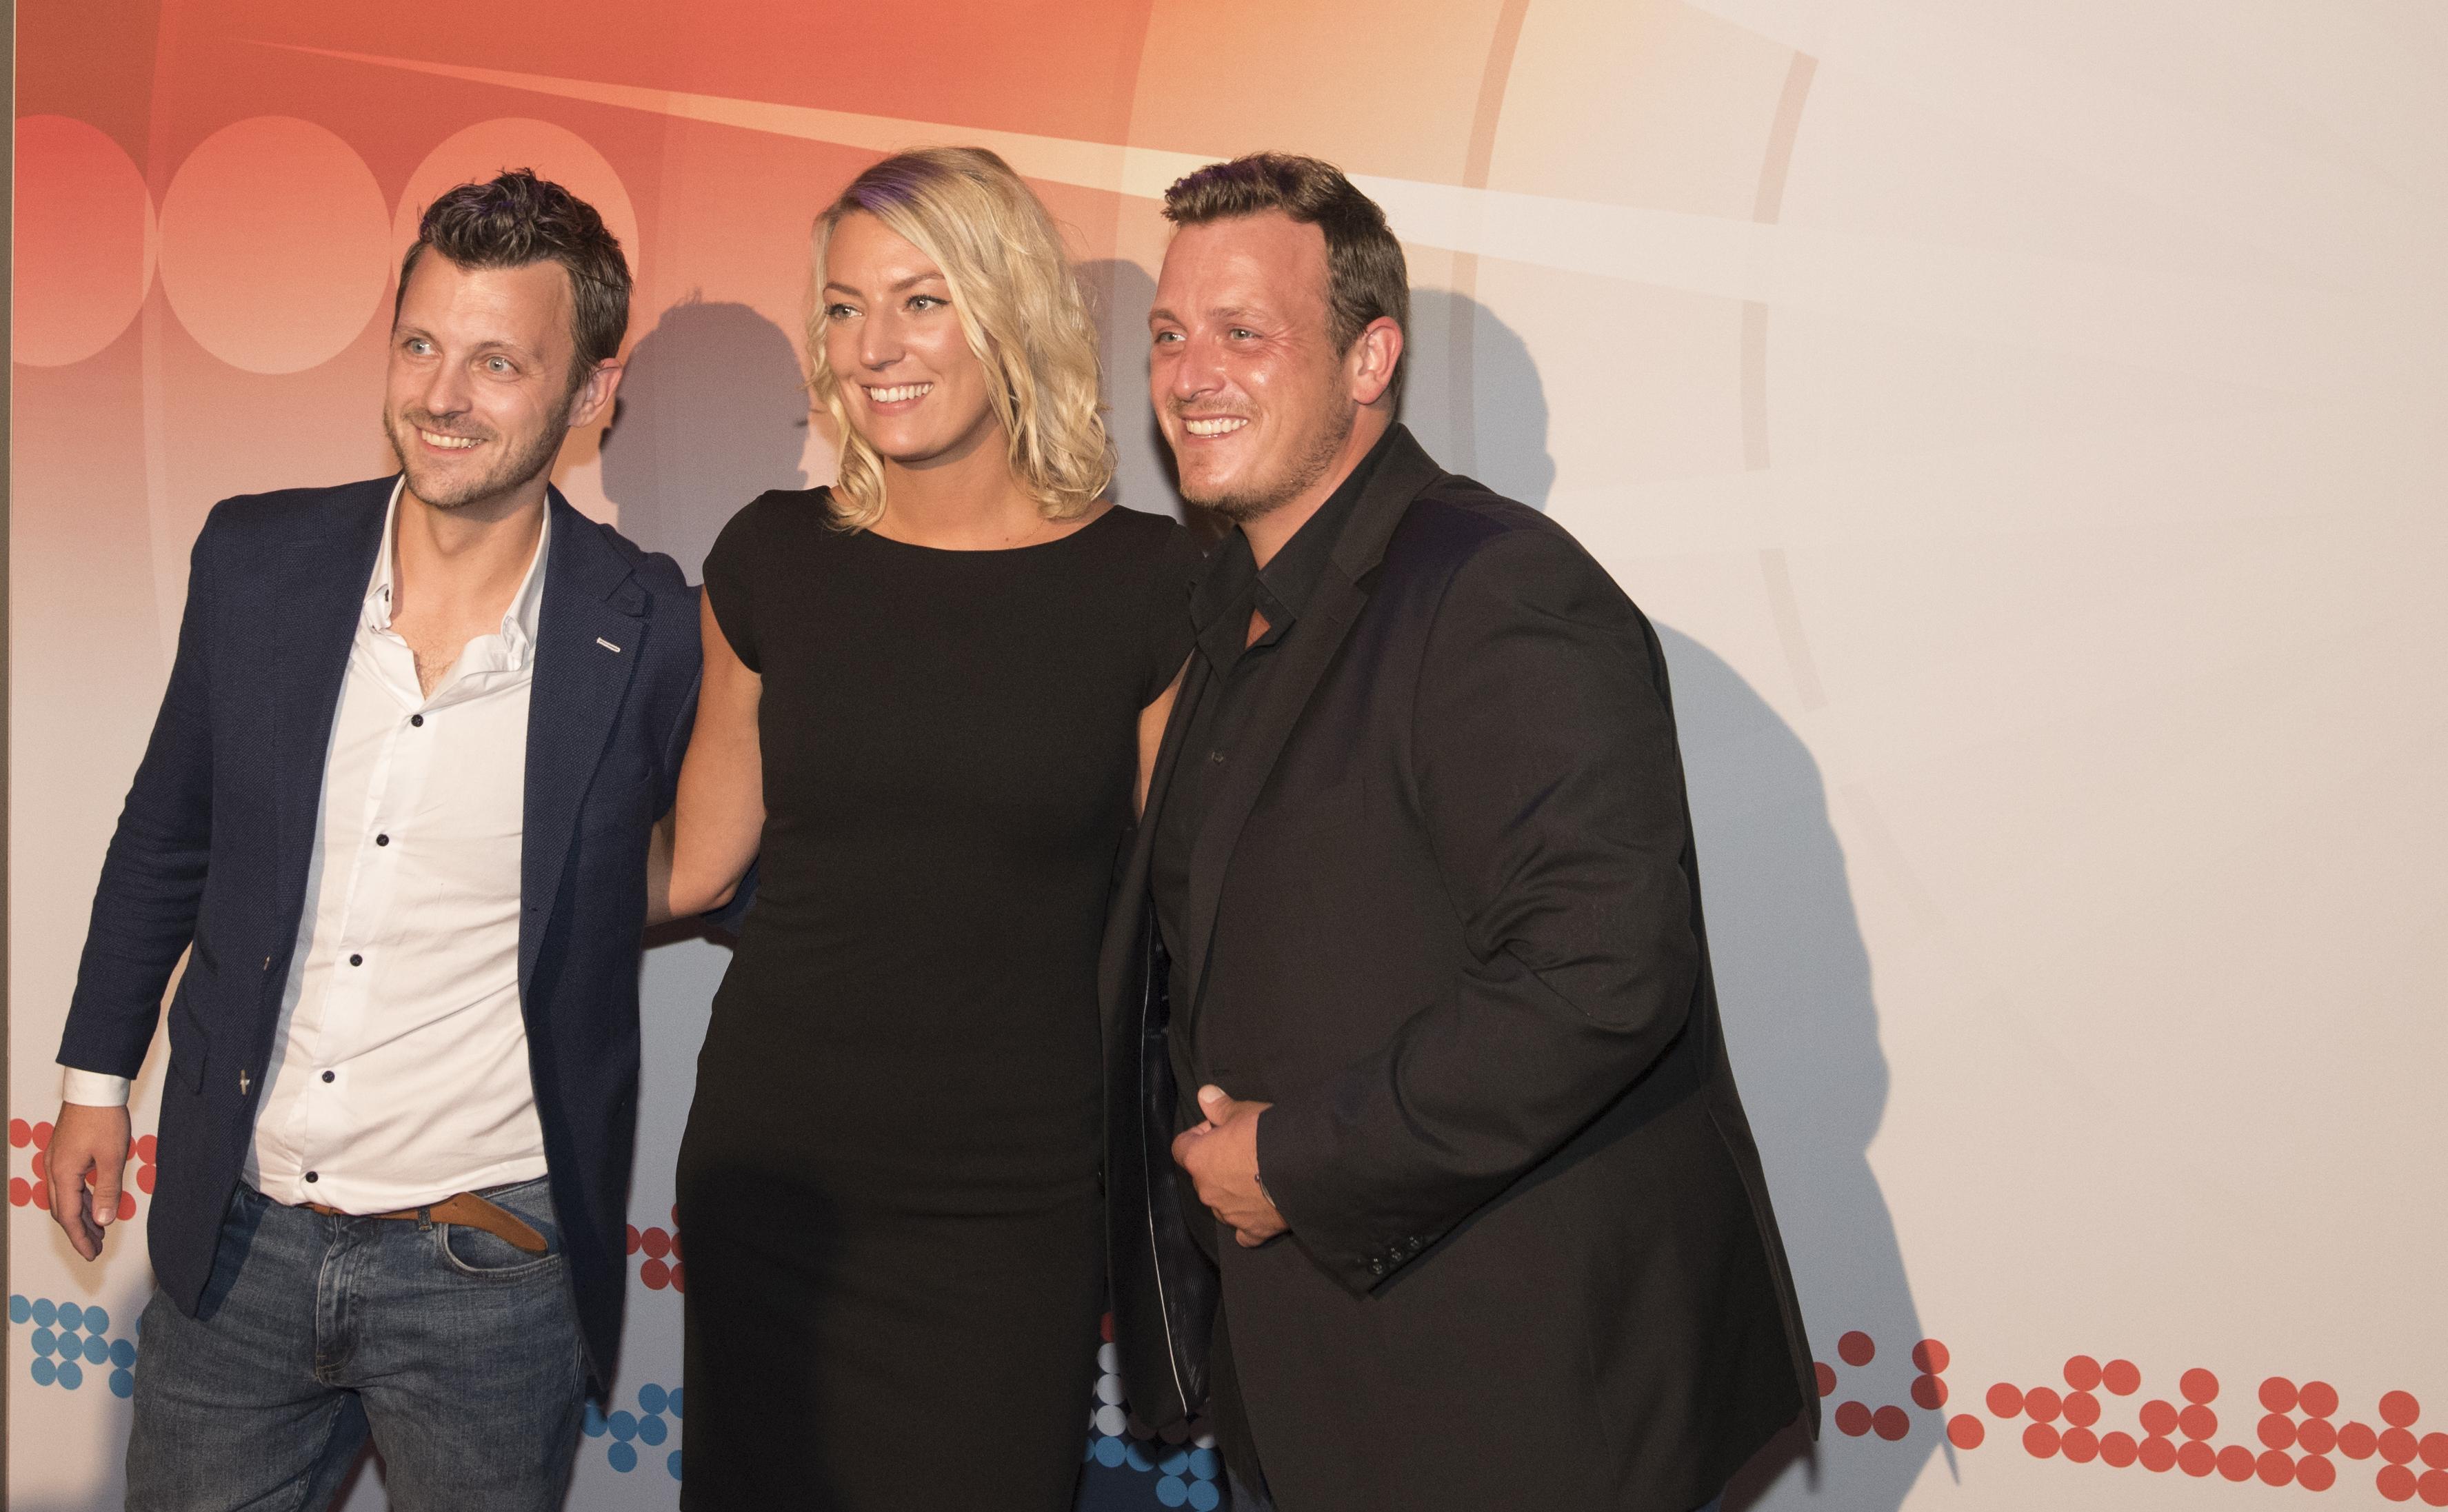 Michael Hartkamp, Yannick Berends en Joey Hartkamp tijdens Buma NL Awards 2017 - Fotocredits: Shali Blok (ArtiestenNieuws)